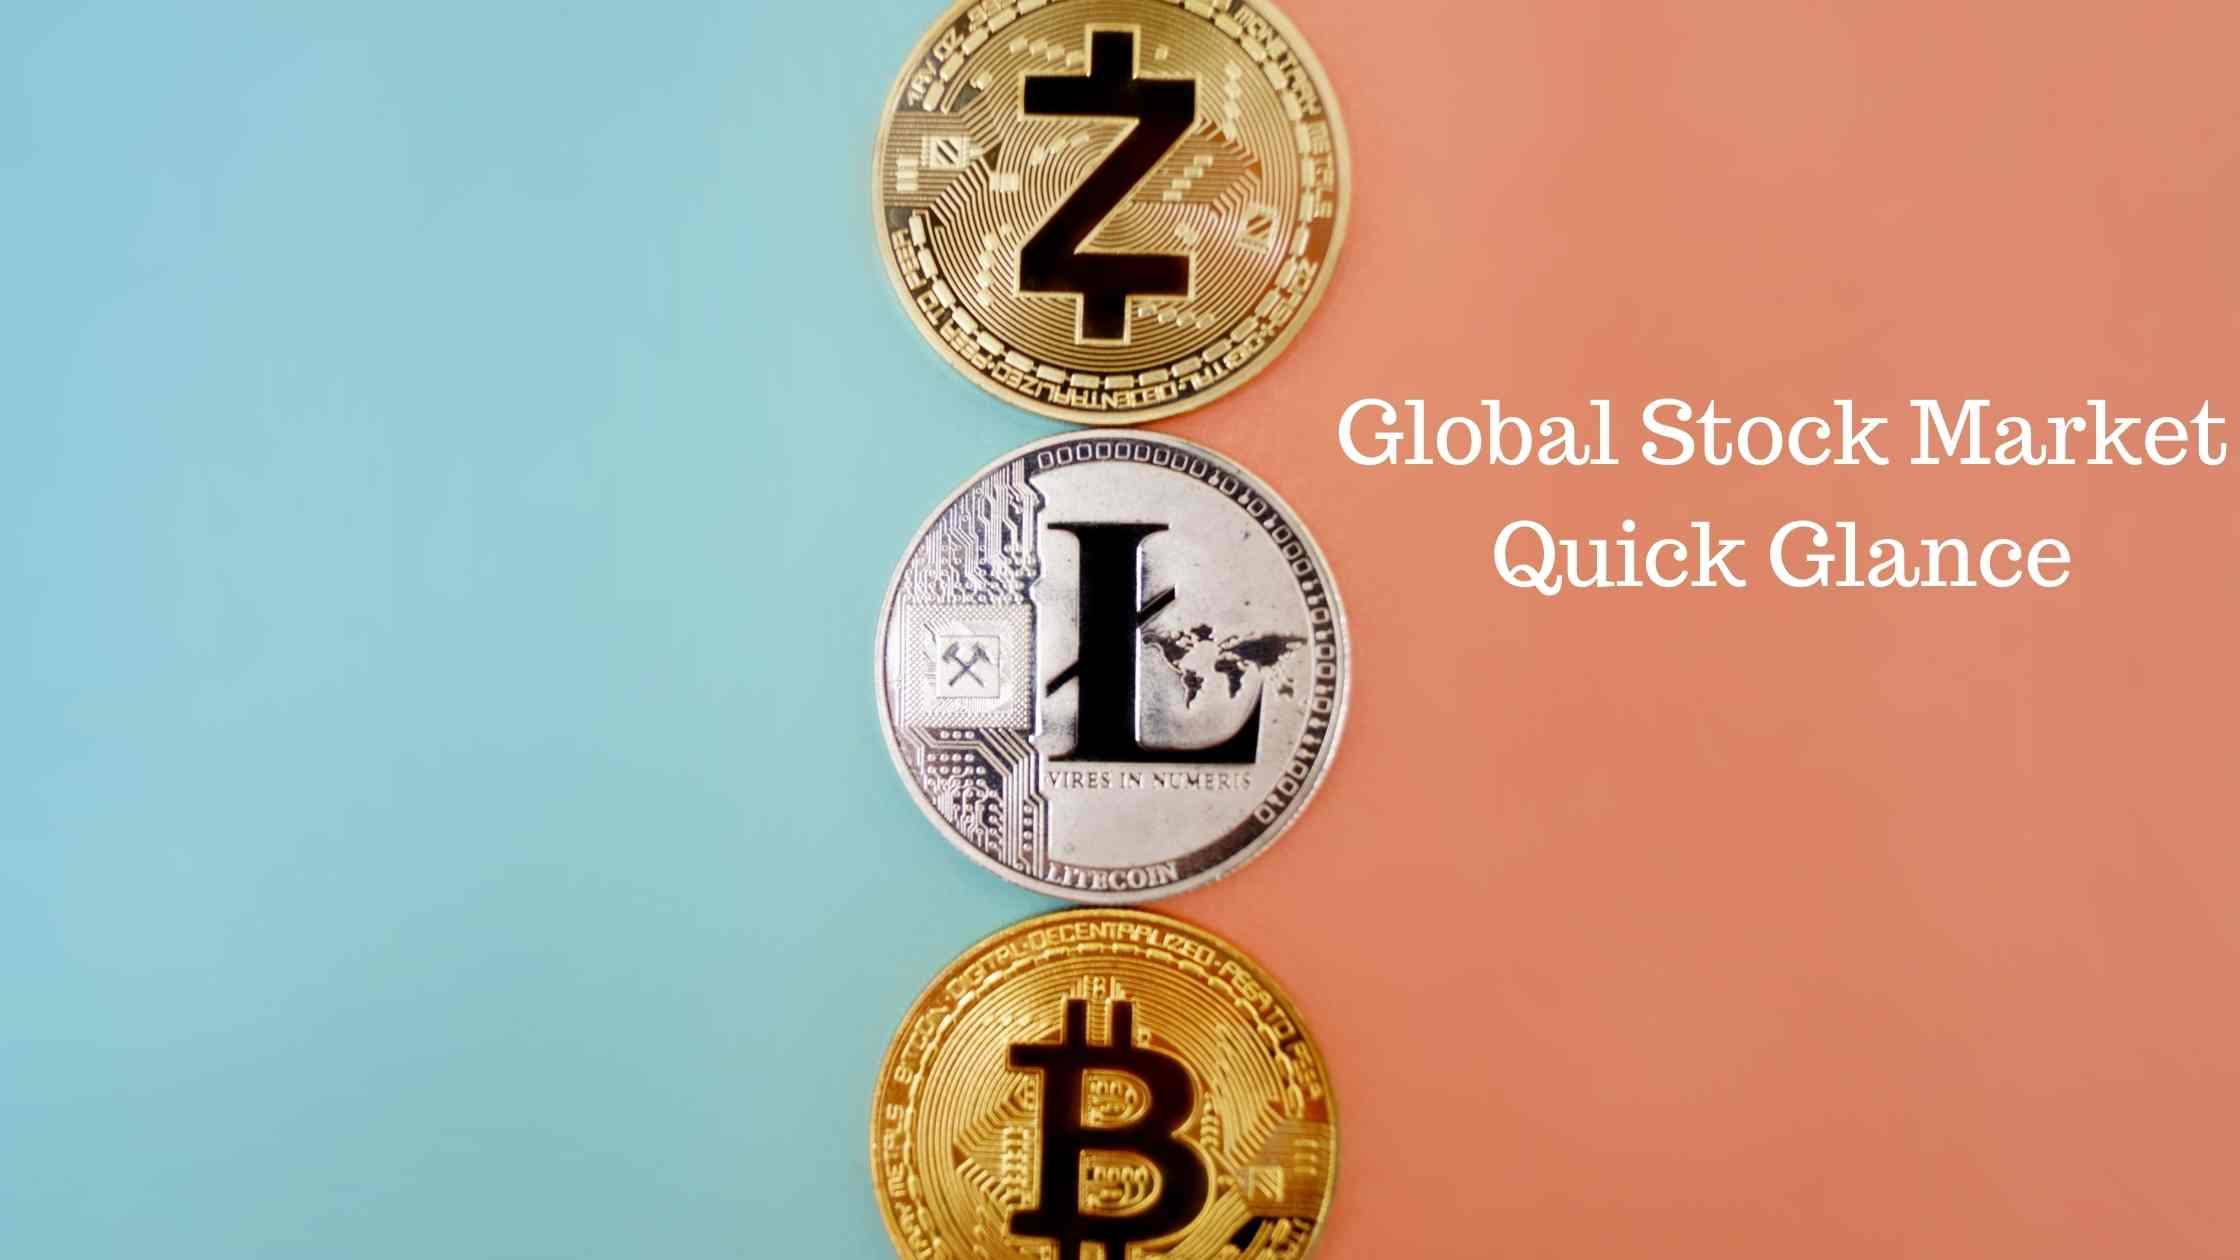 Global Stock Market Quick Glance